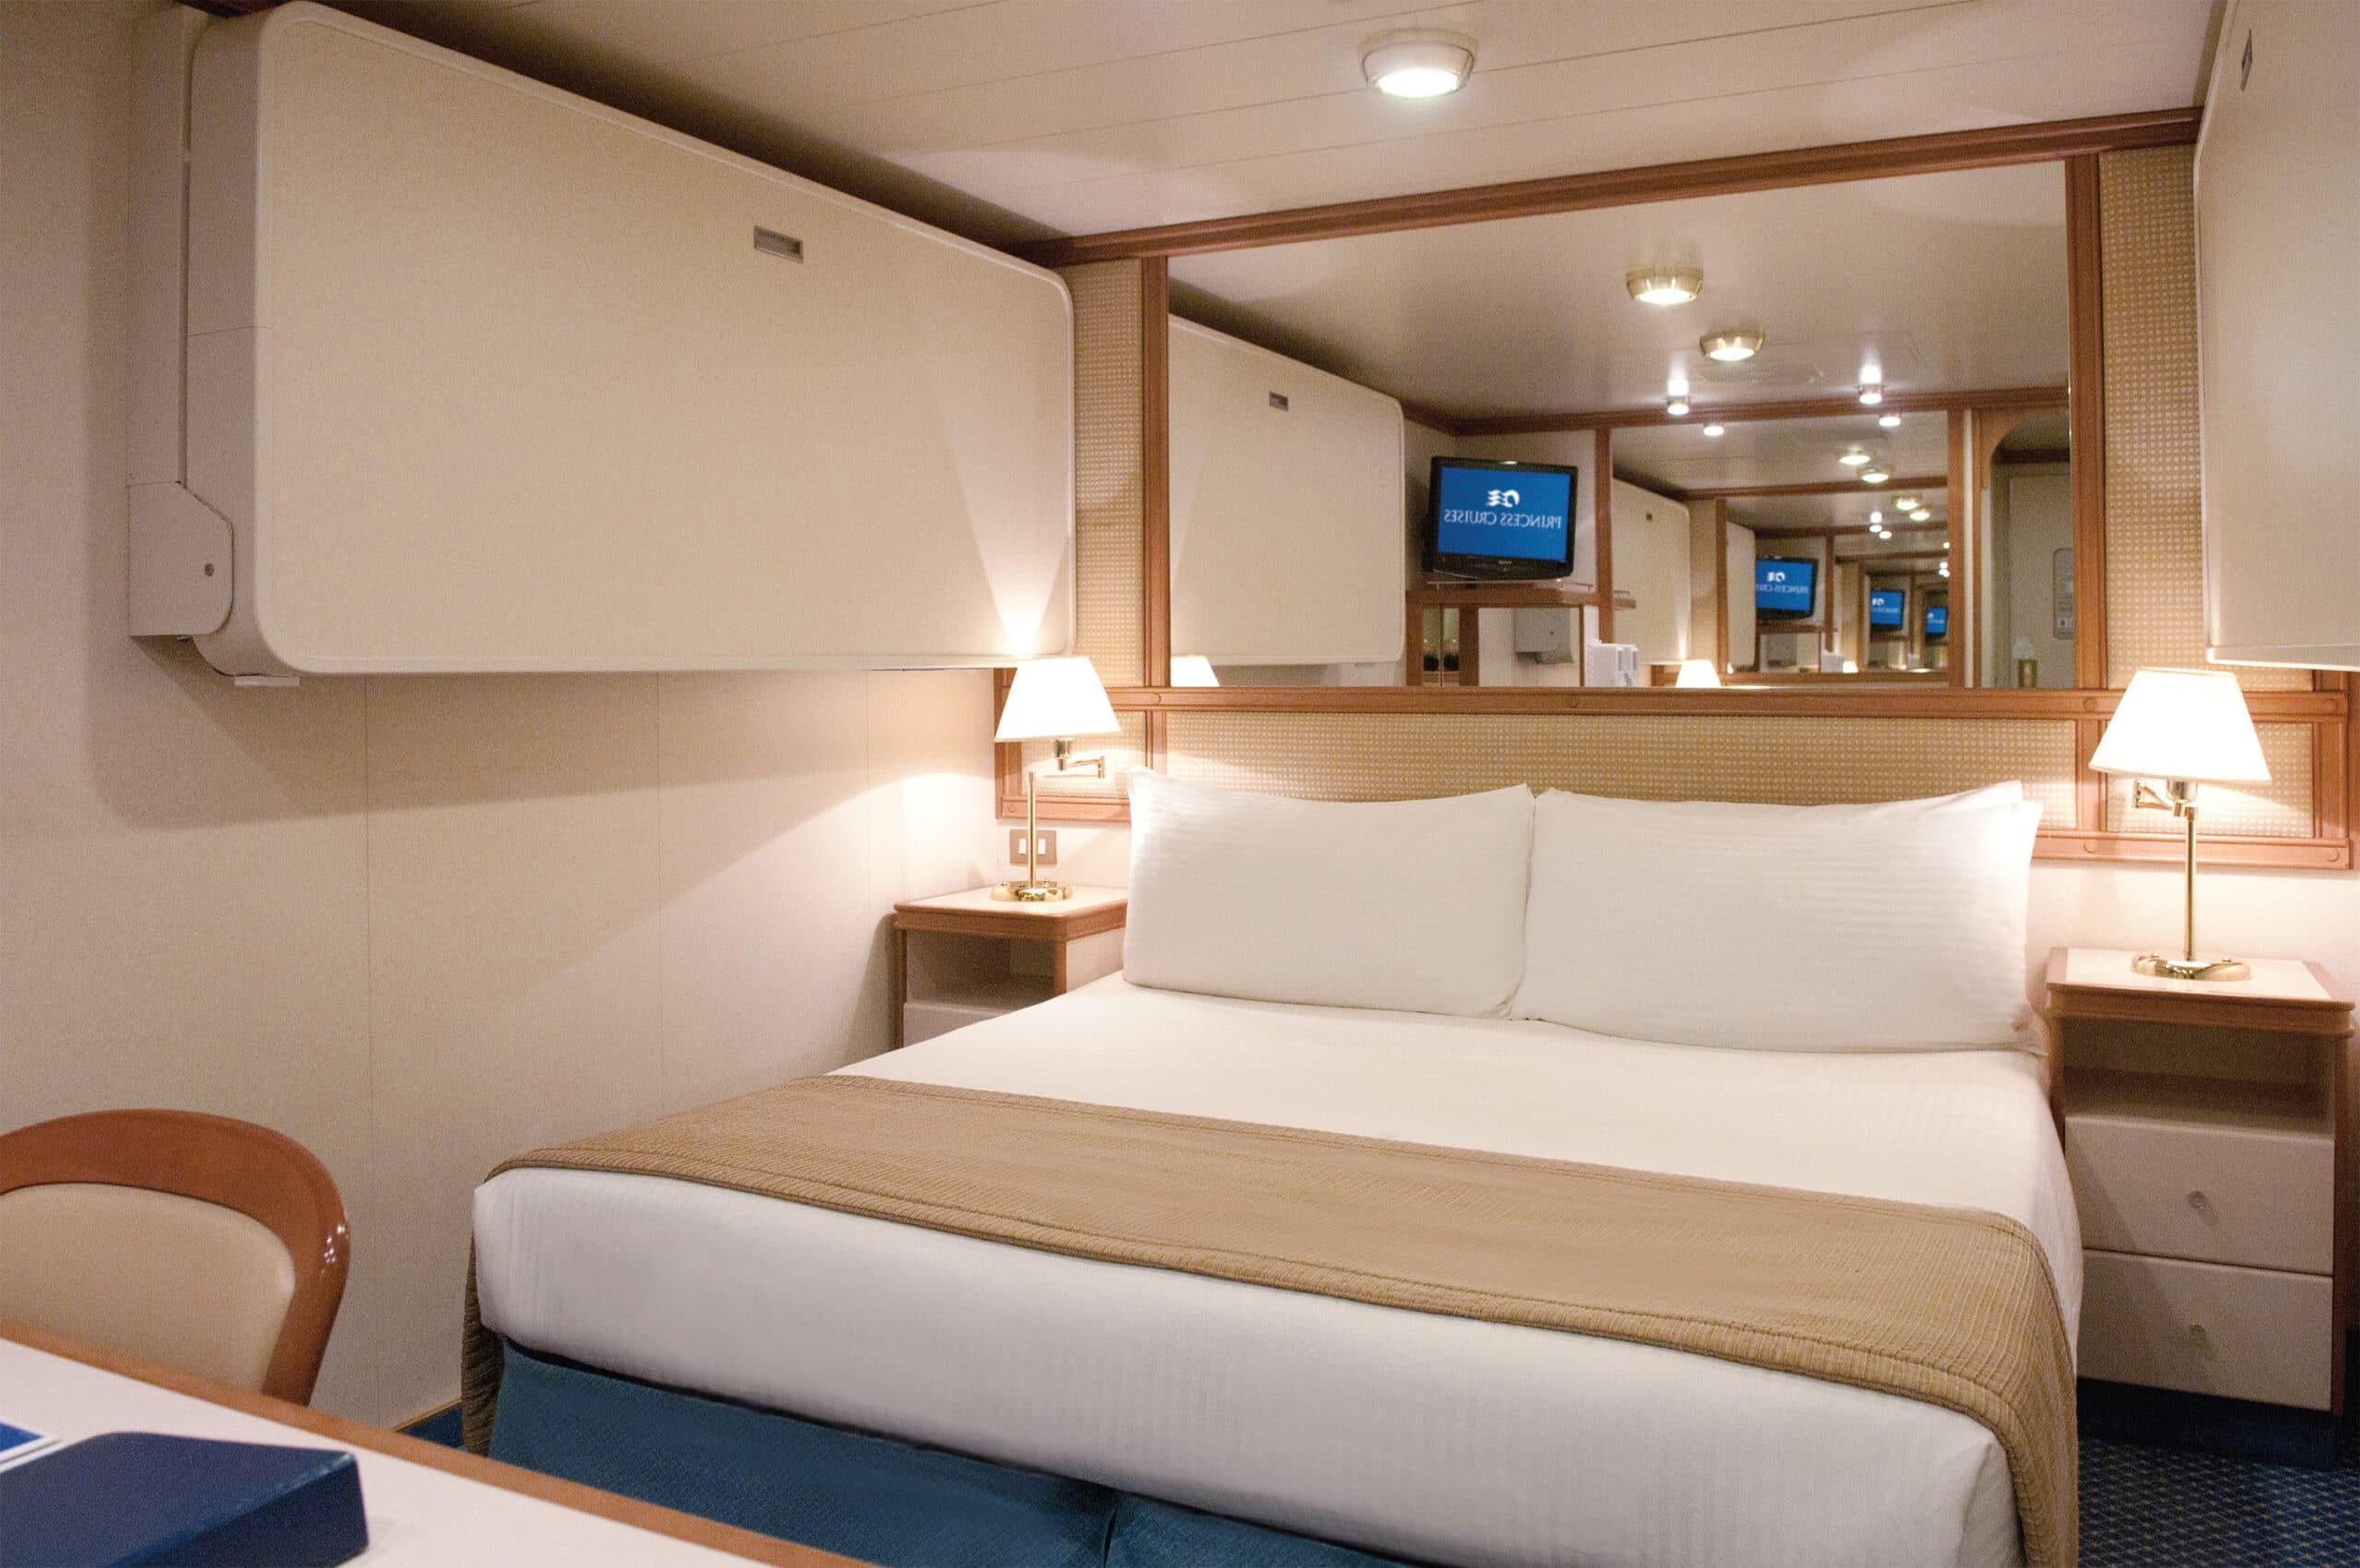 Princess-cruises-Crown-princess-schip-cruiseschip-categorie ia-ib-ic-id-ie-if-binnenhut